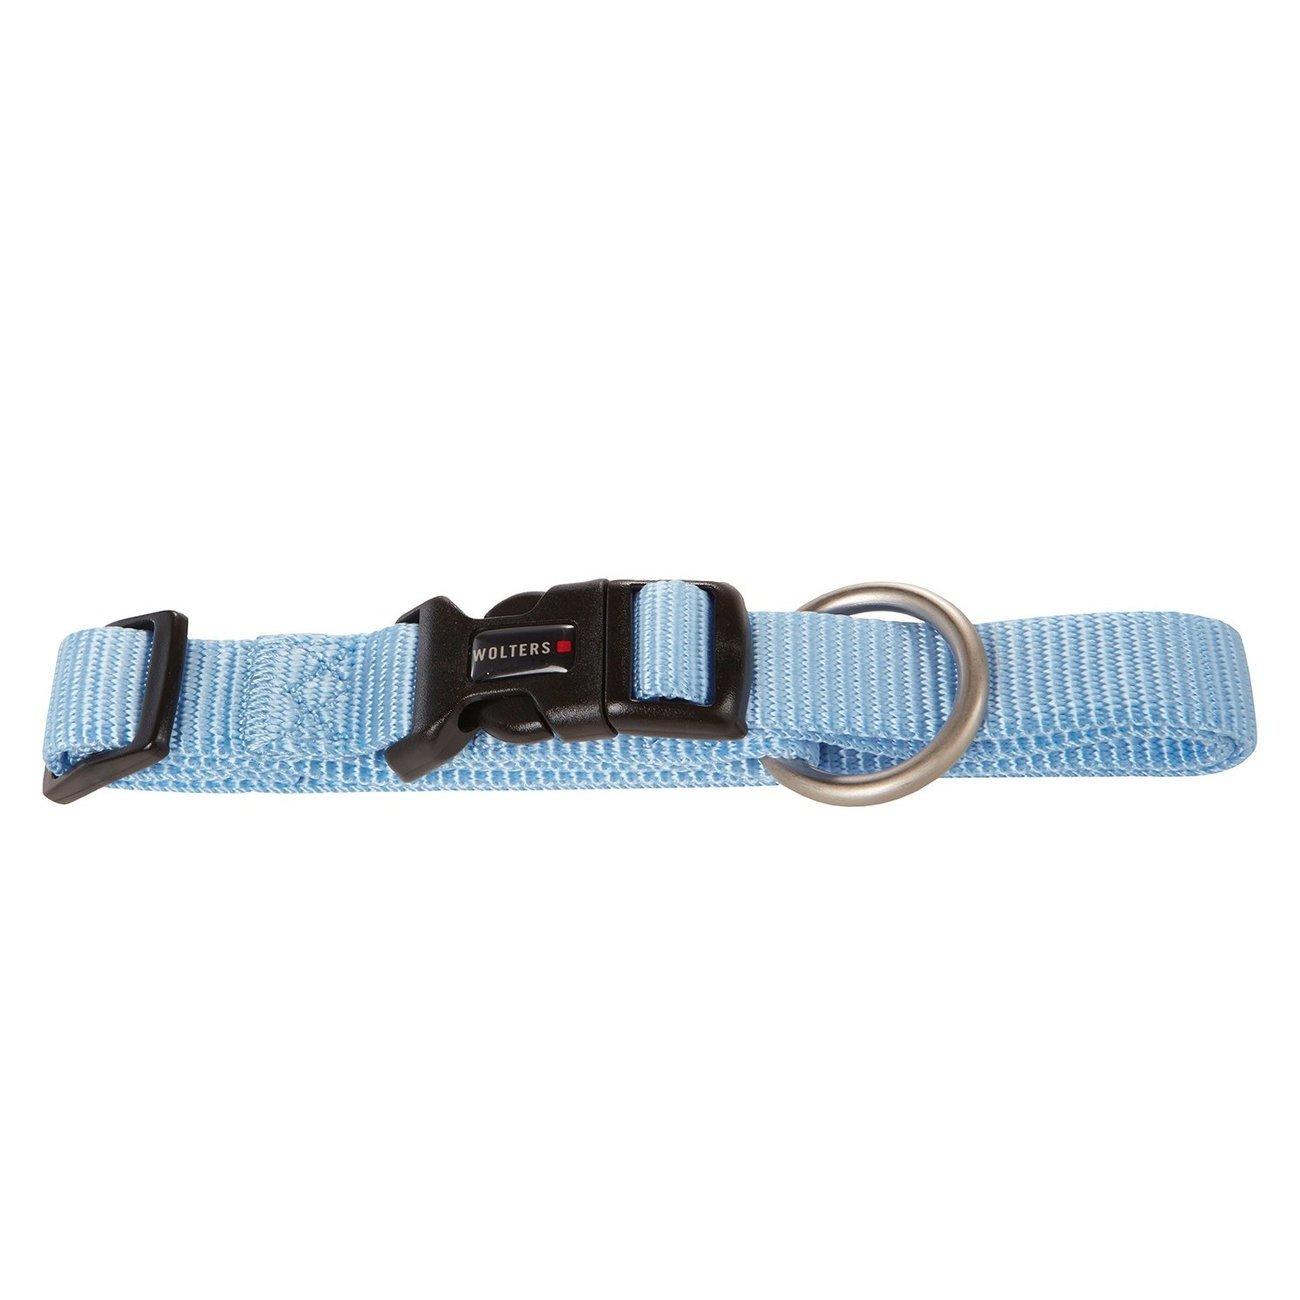 Wolters Halsband Nylon Professional, Bild 10